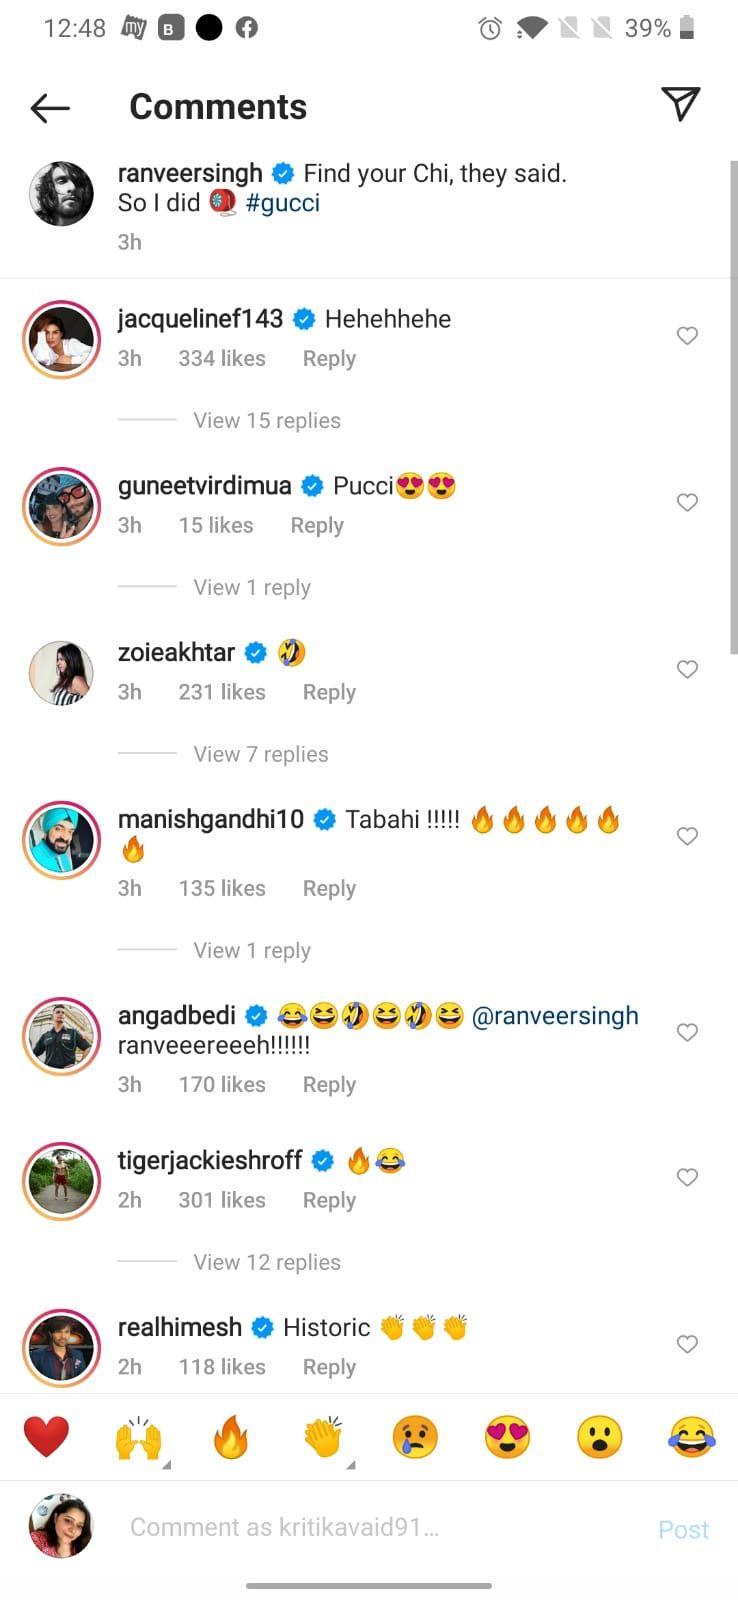 Ranveer Singh's comment section